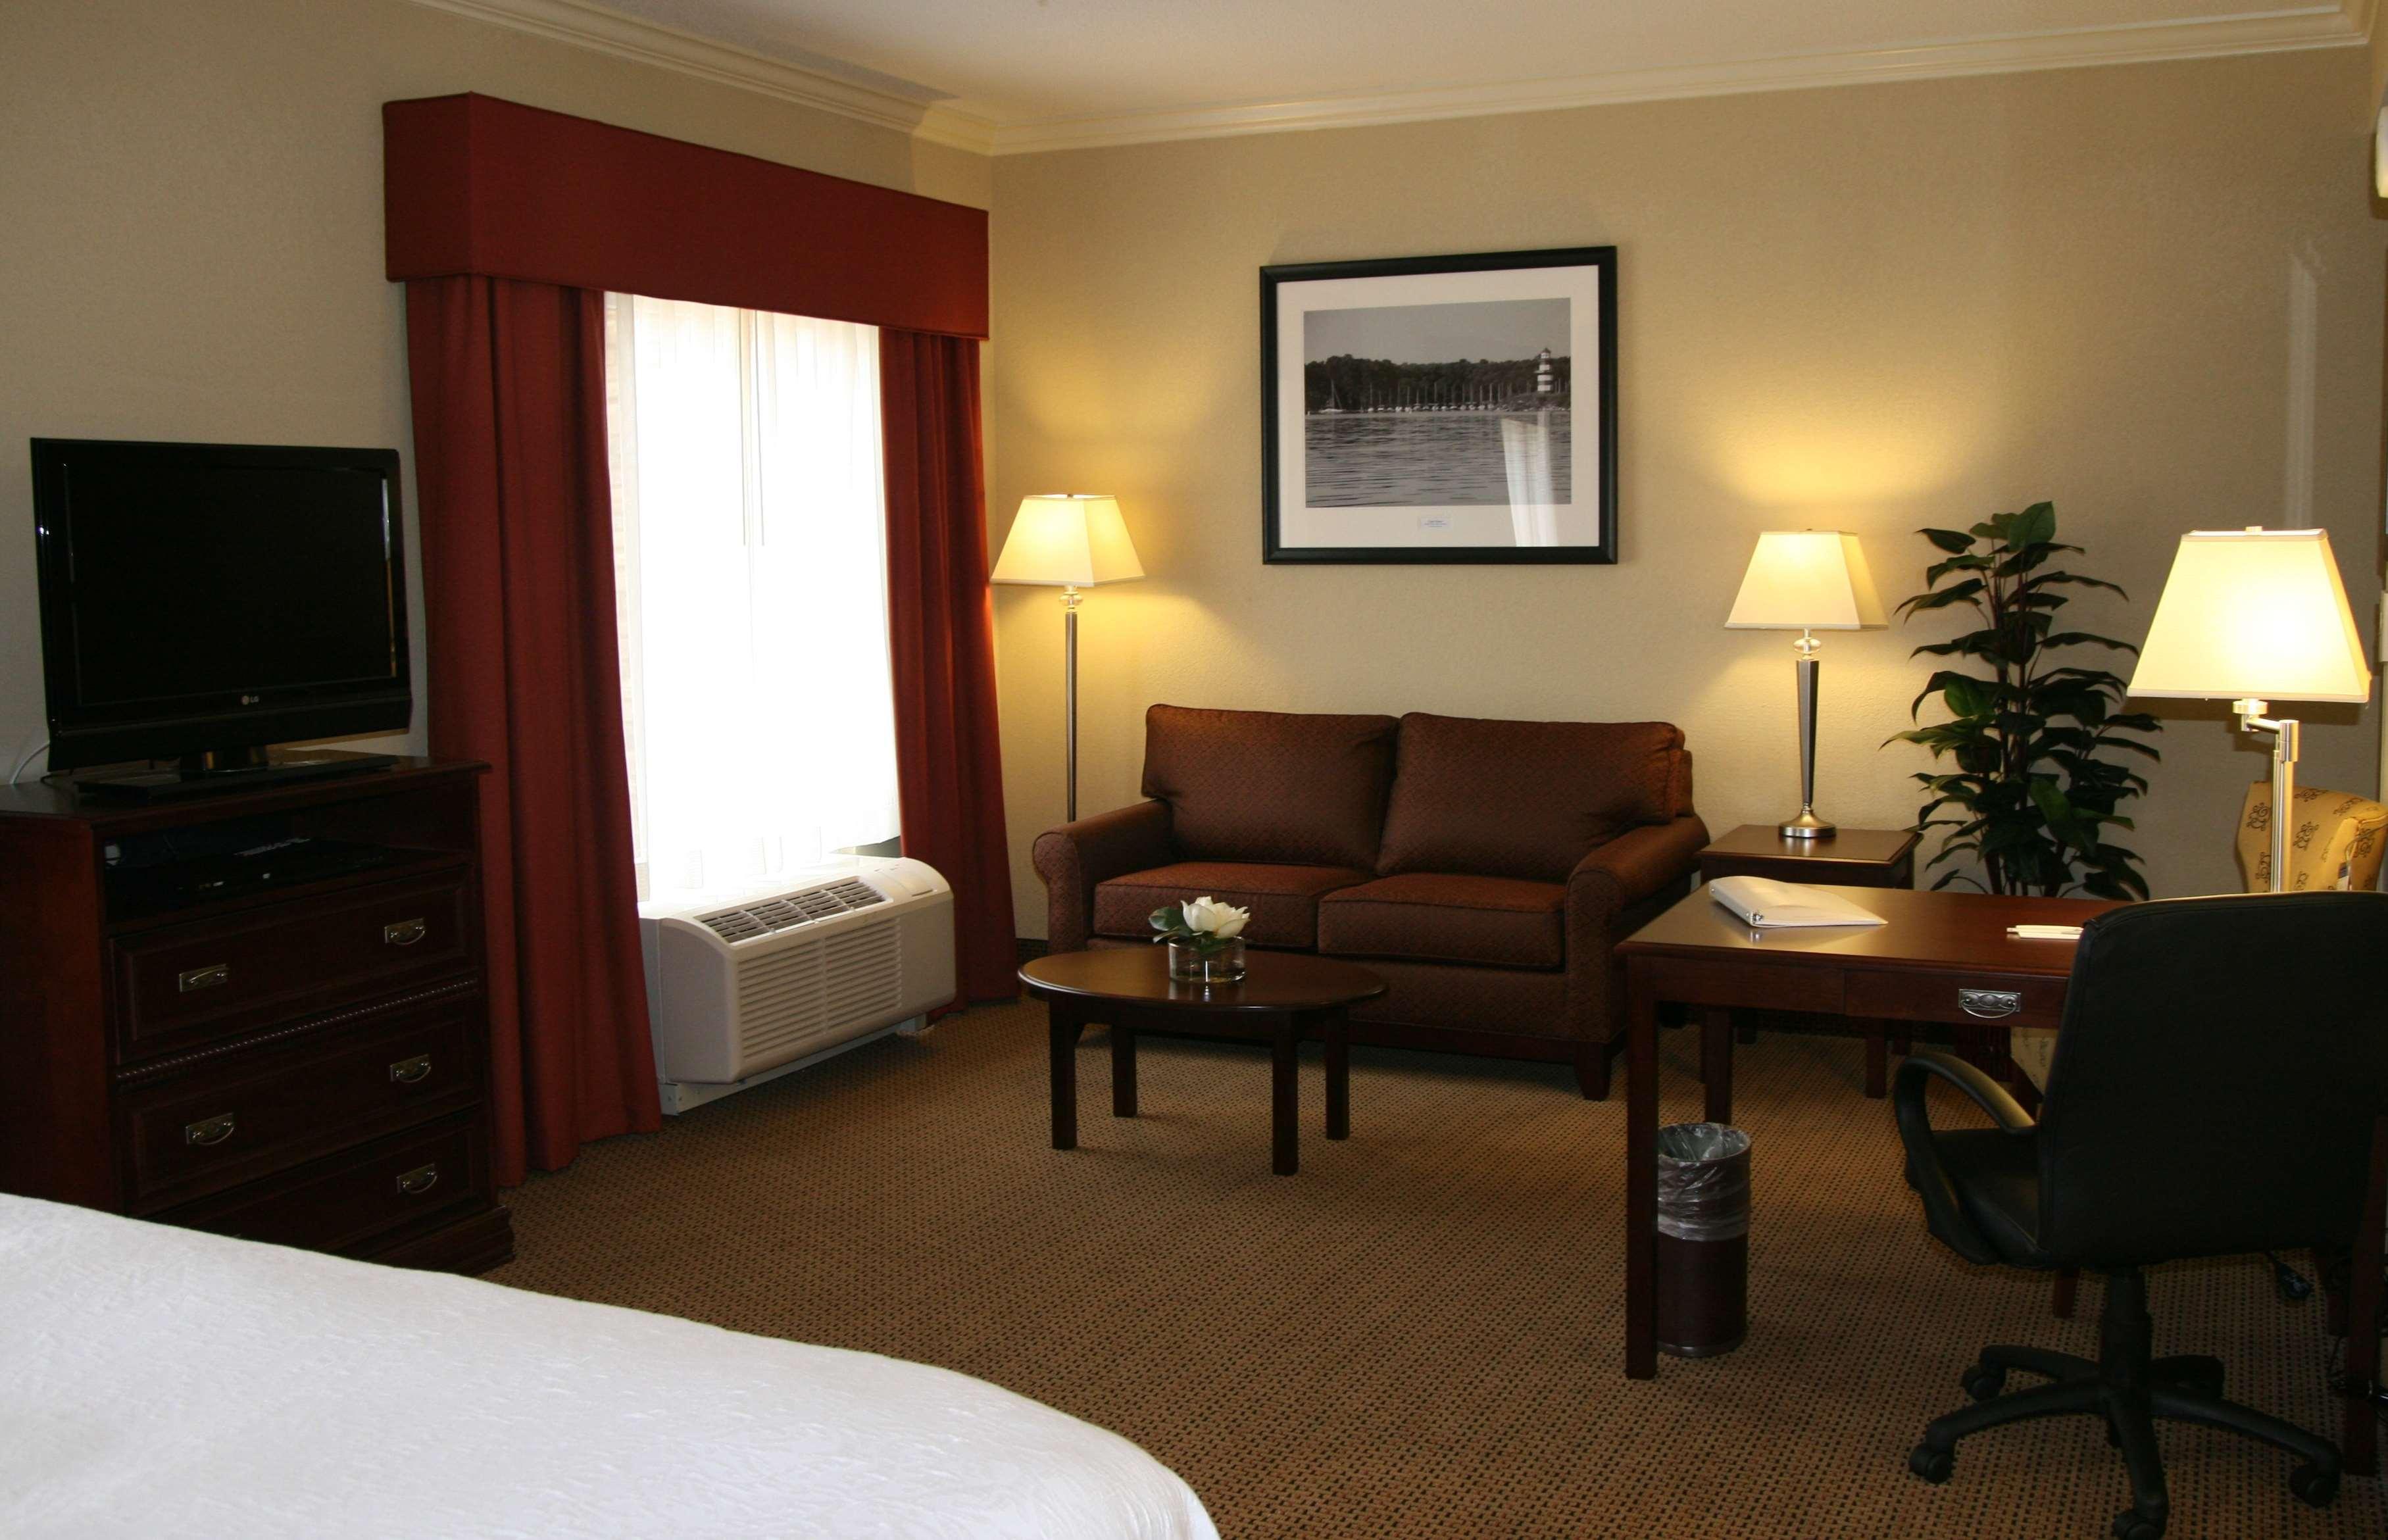 Hampton Inn & Suites Lanett-West Point image 17